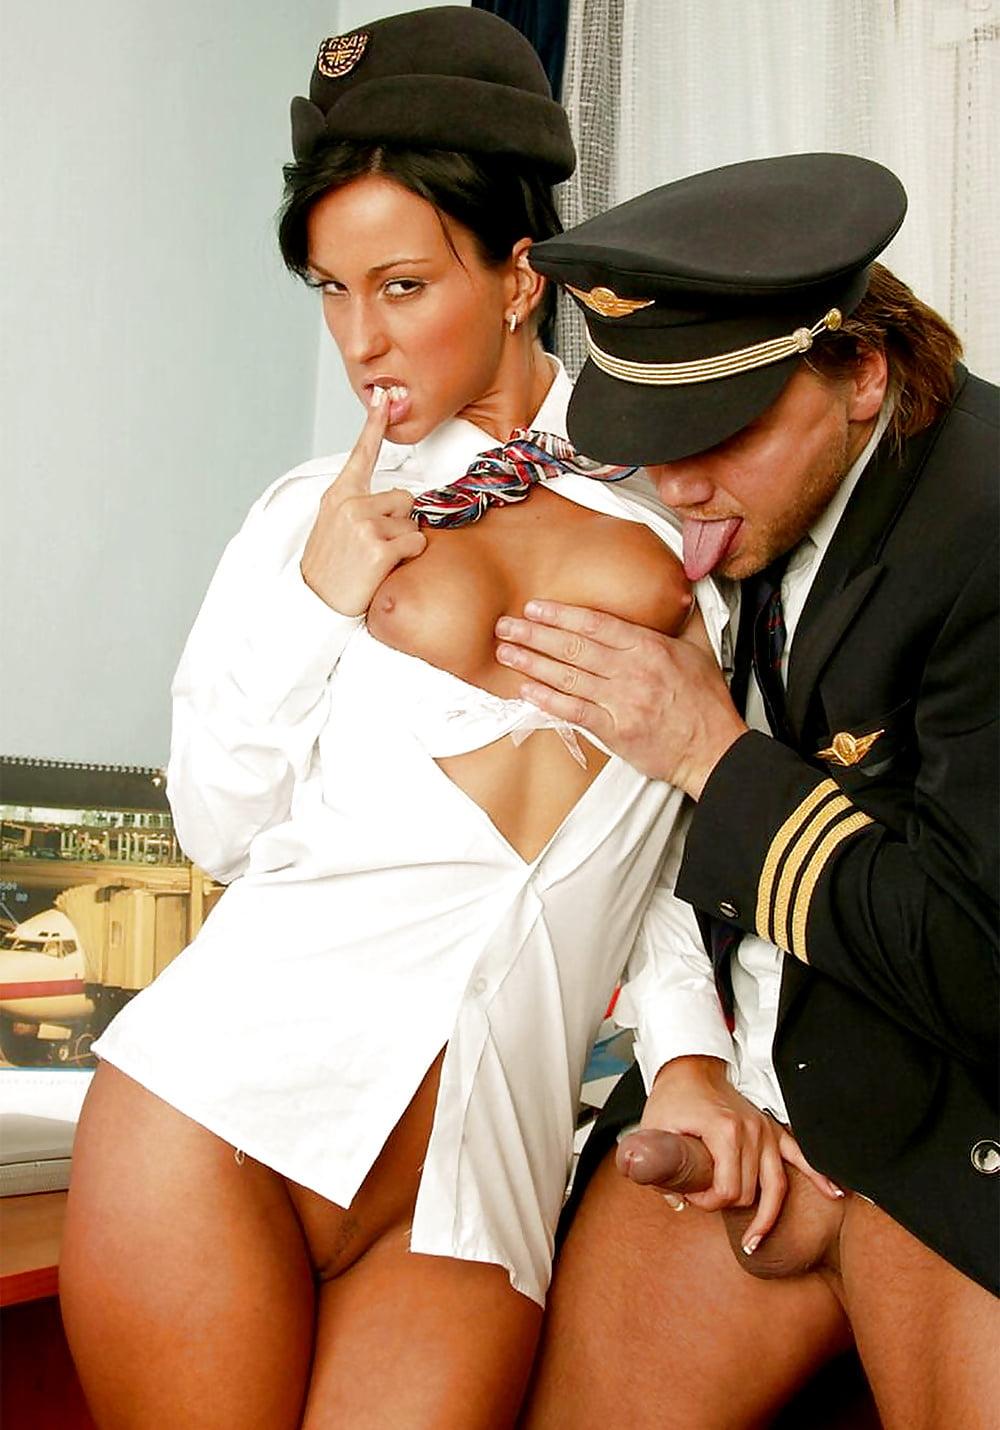 Pilot Fucks A Stewardess Porn Photo